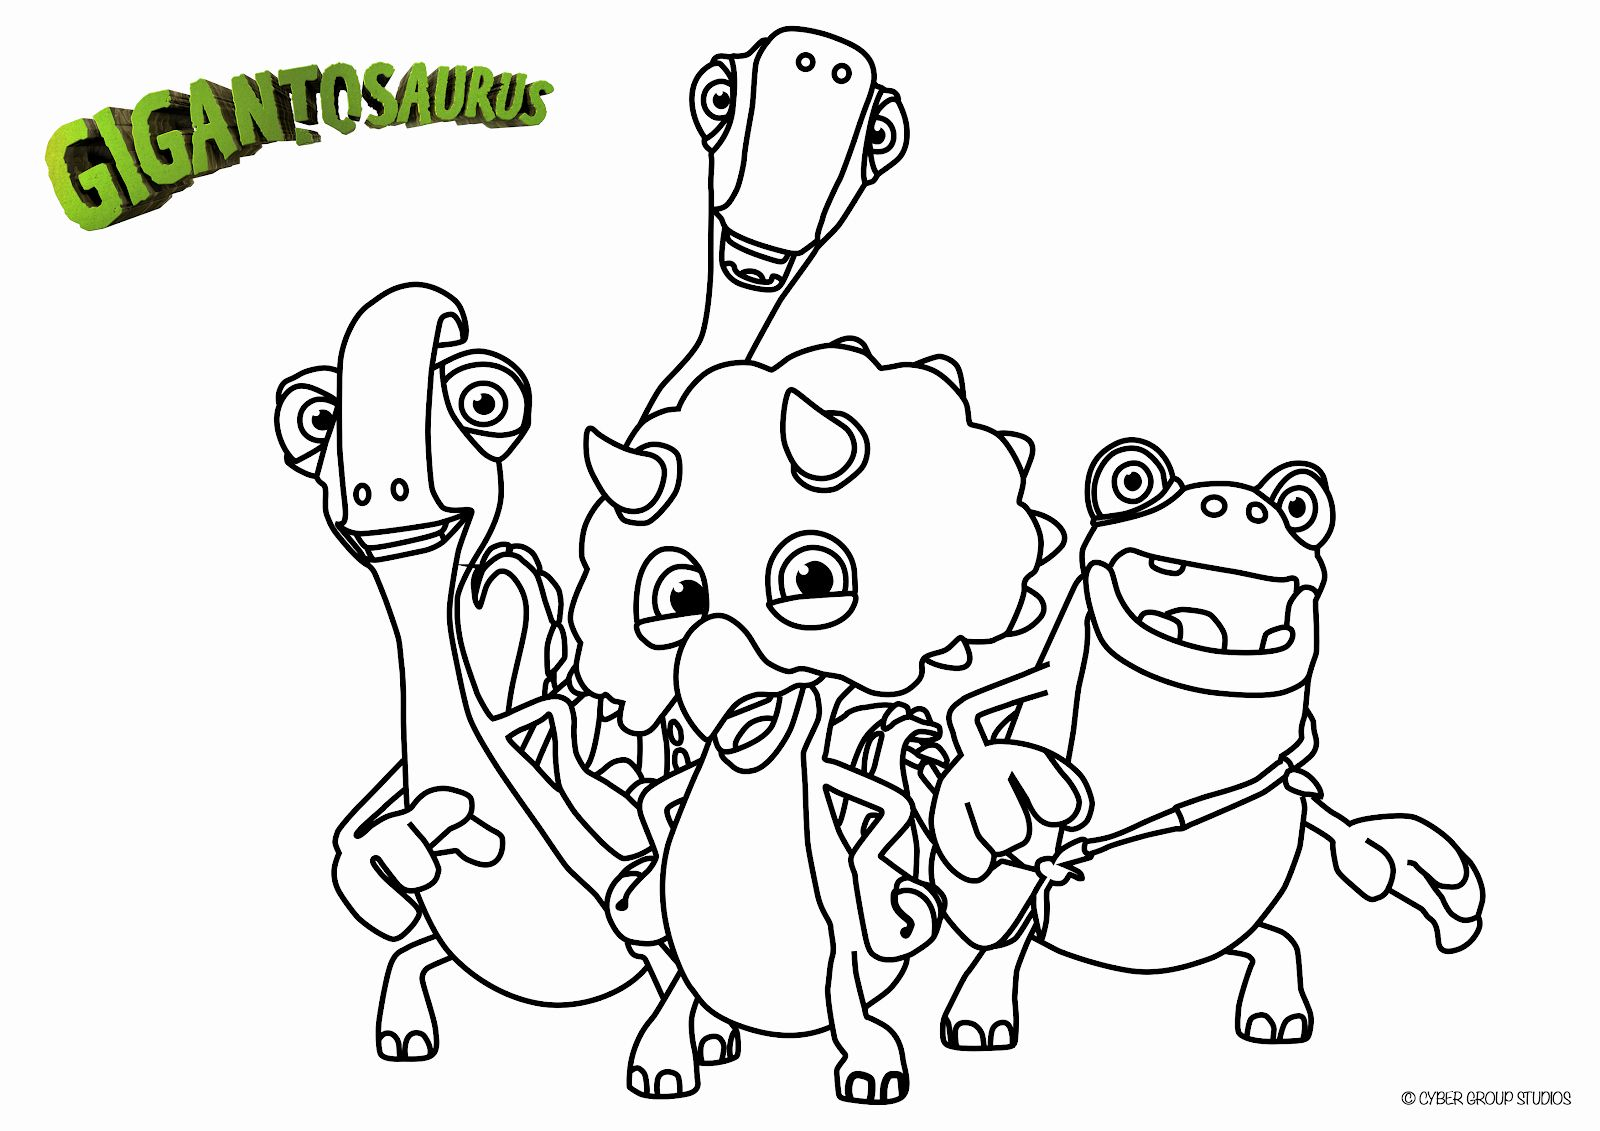 Disney Junior Coloring Book Awesome Gigantosaurus On Disney Junior